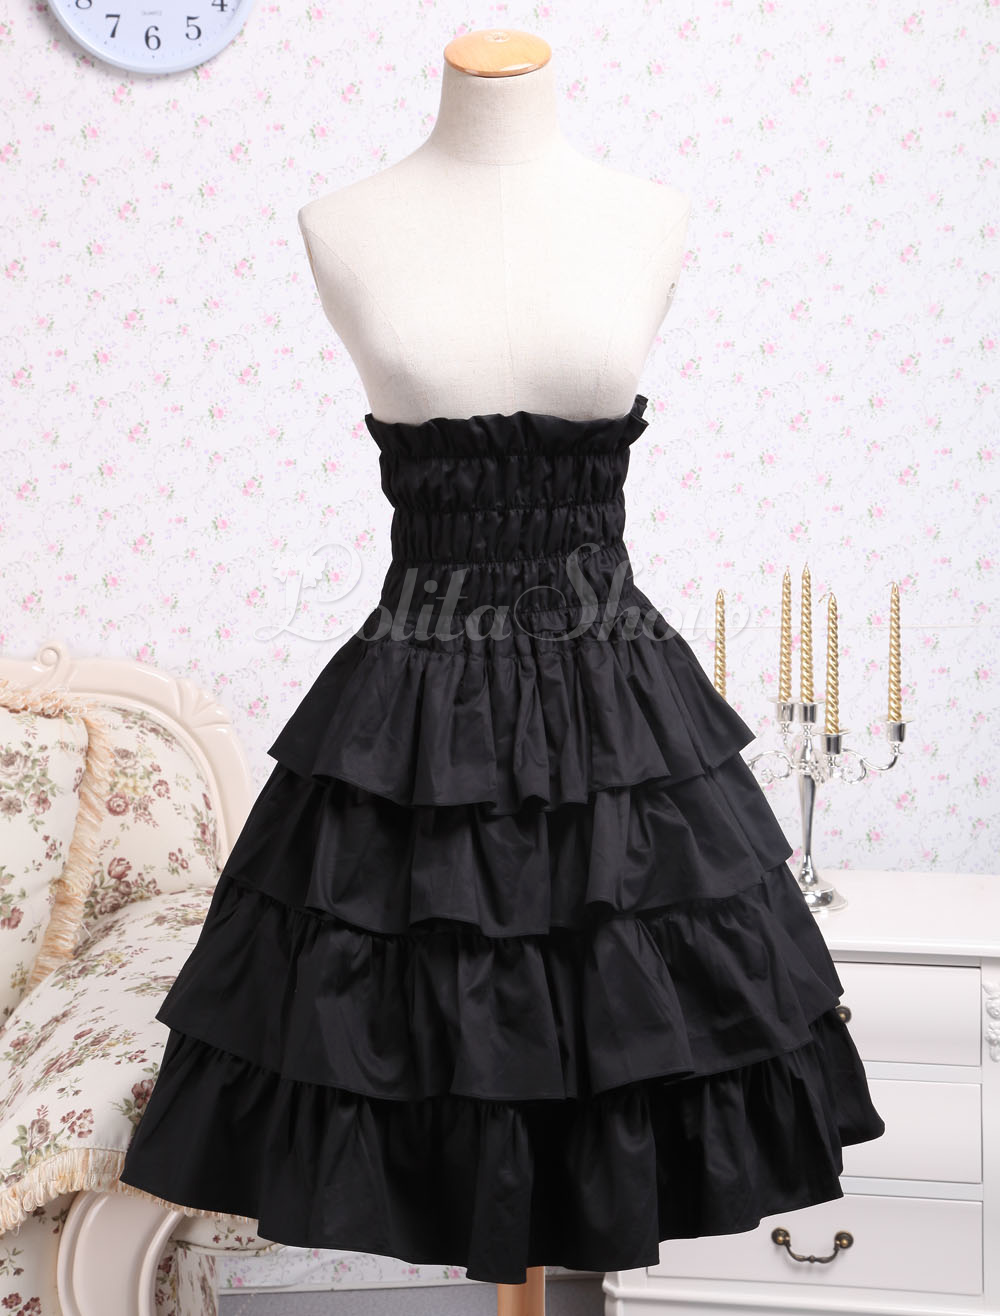 Lolitashow Classic Cotton Black Ruffle Lolita Skirt - Lolitashow.com